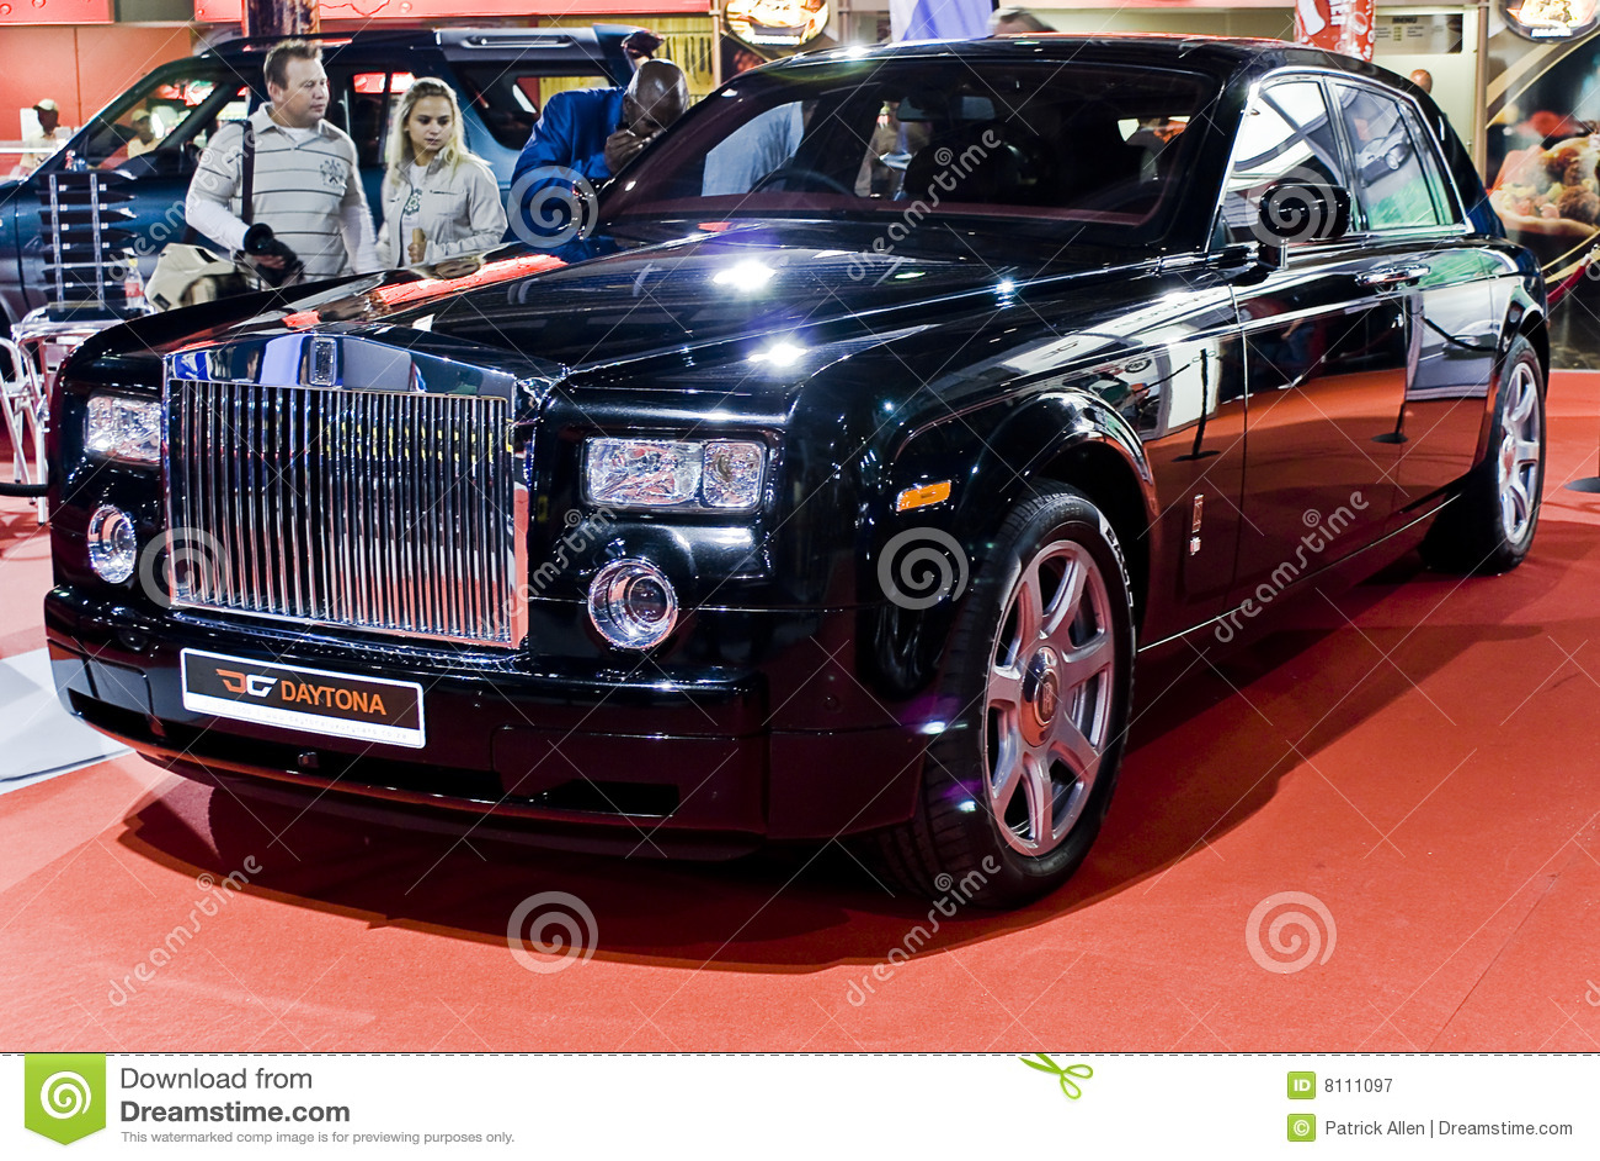 Rolls Royce Phantom - MPH